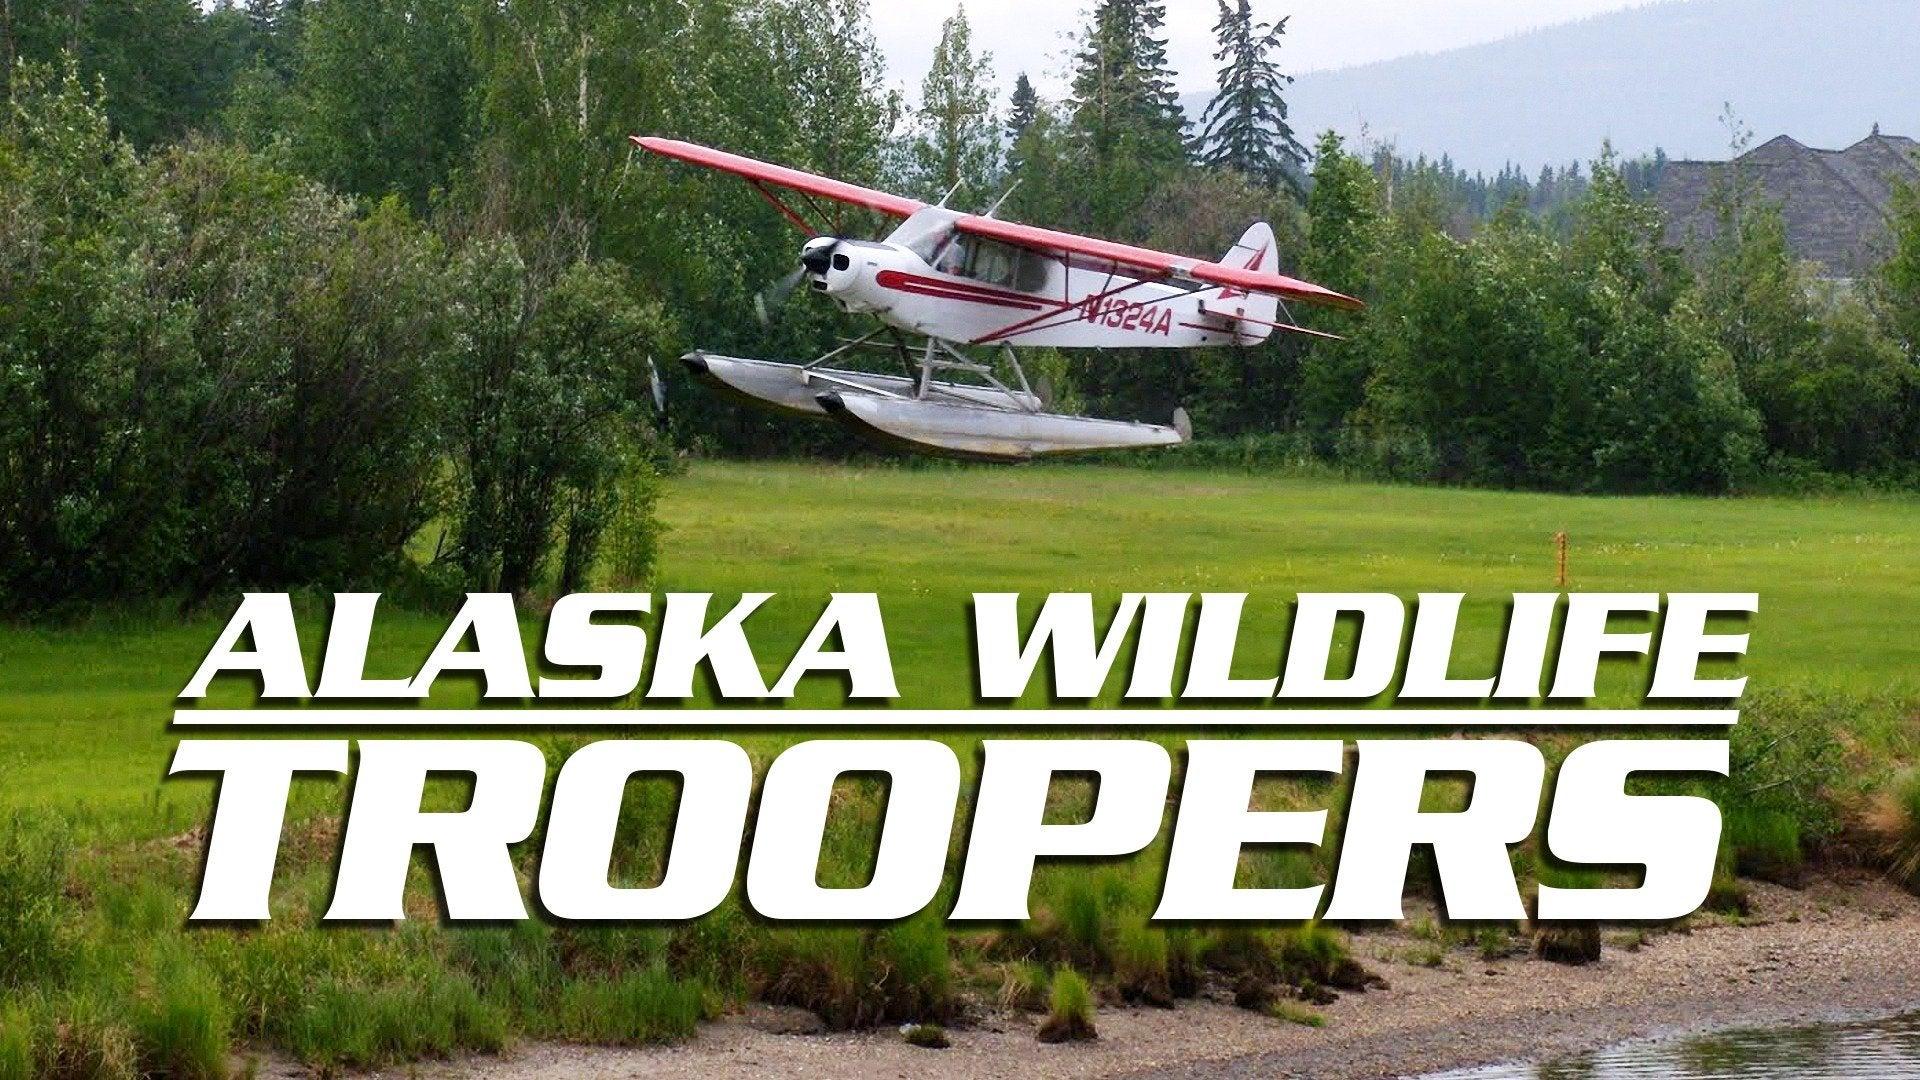 Alaska Wildlife Troopers